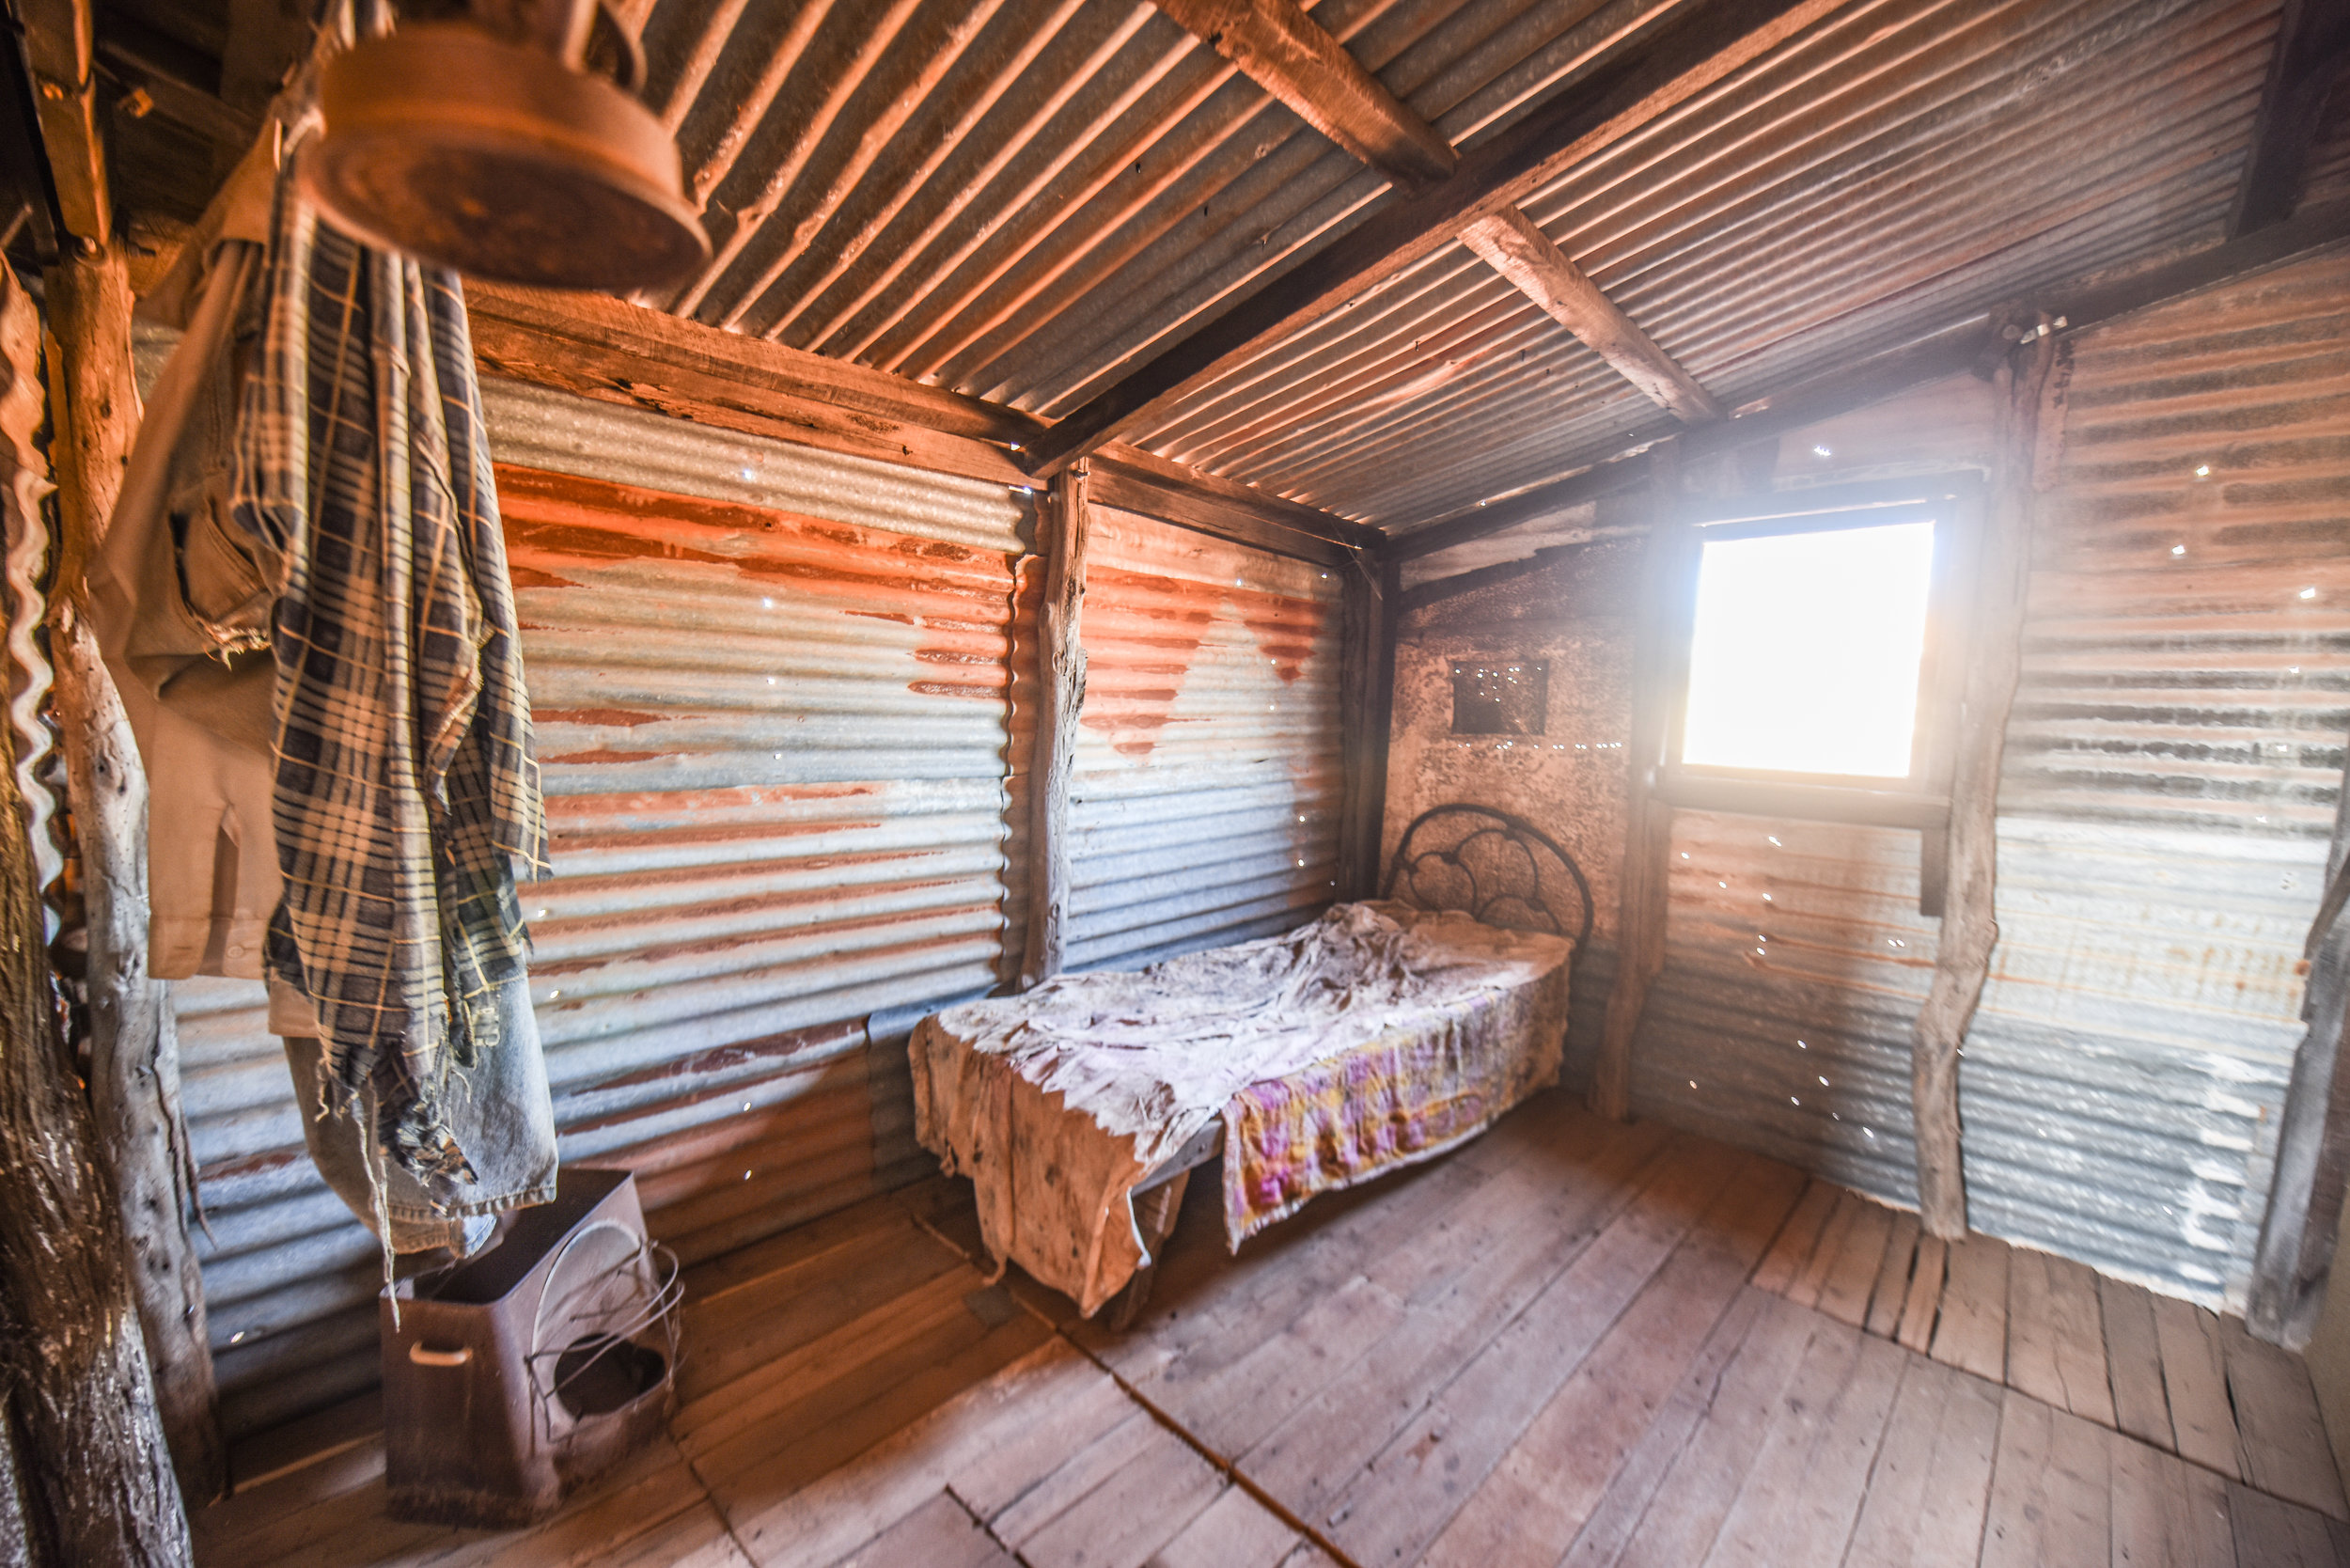 A miner's cottage following restoration. Photo credit: Kate Ferguson